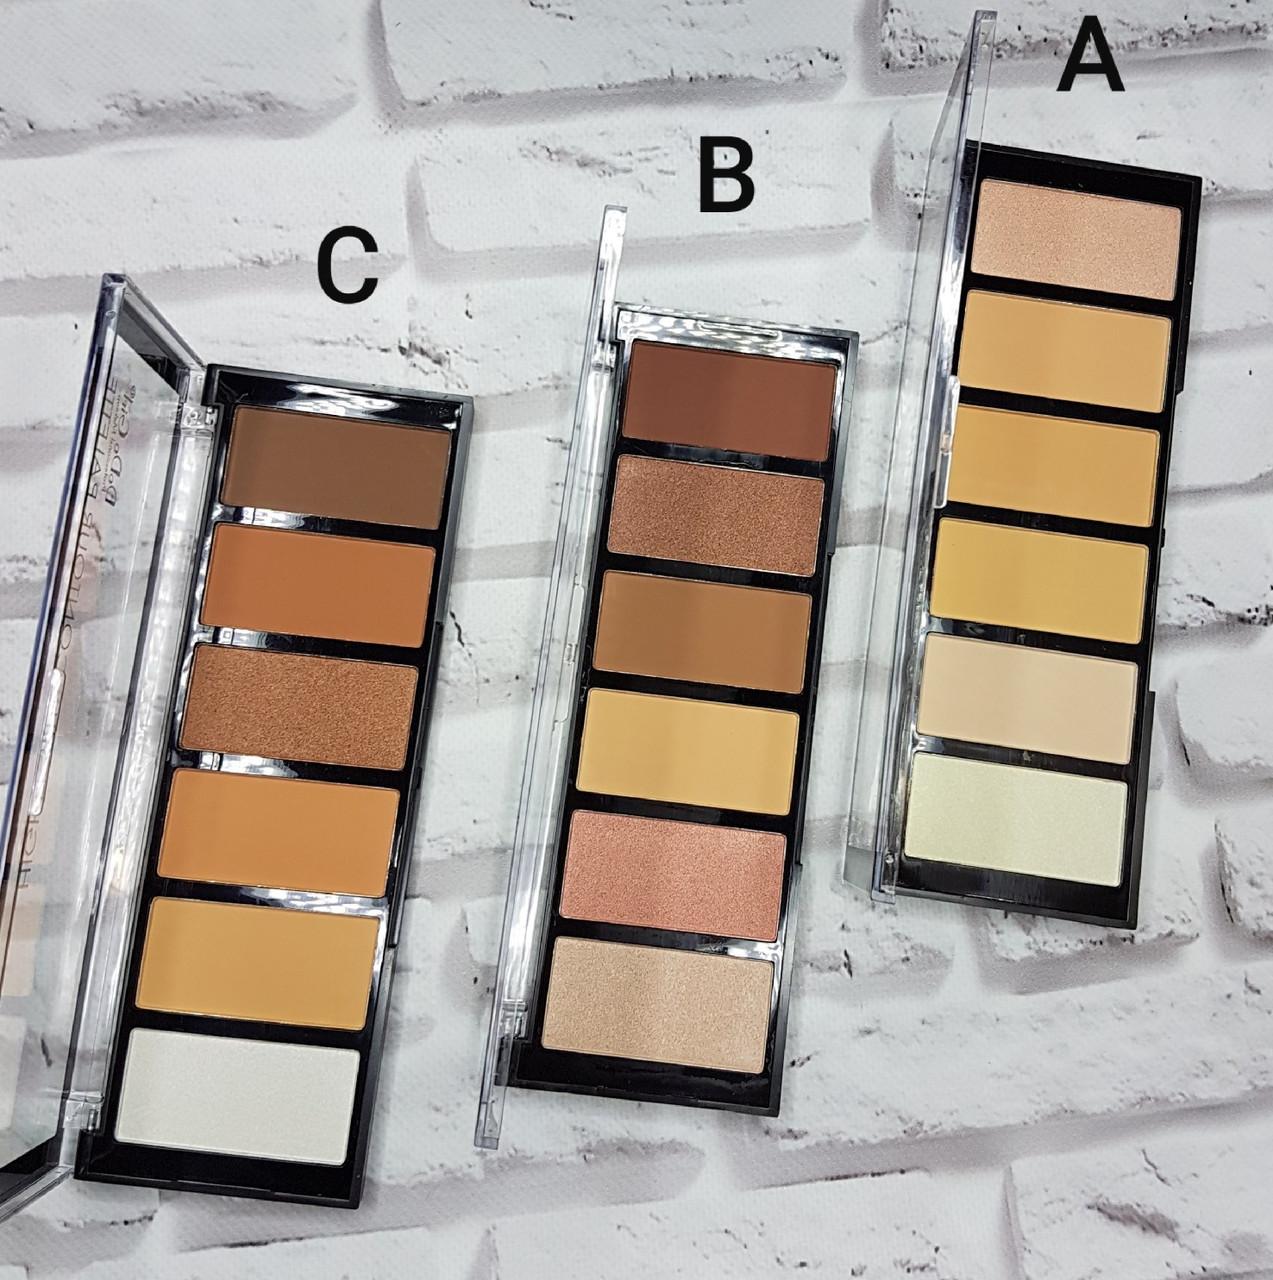 Палетка для контуринга и хайлайтеры DoDo Girl Highlight & Countour Palette